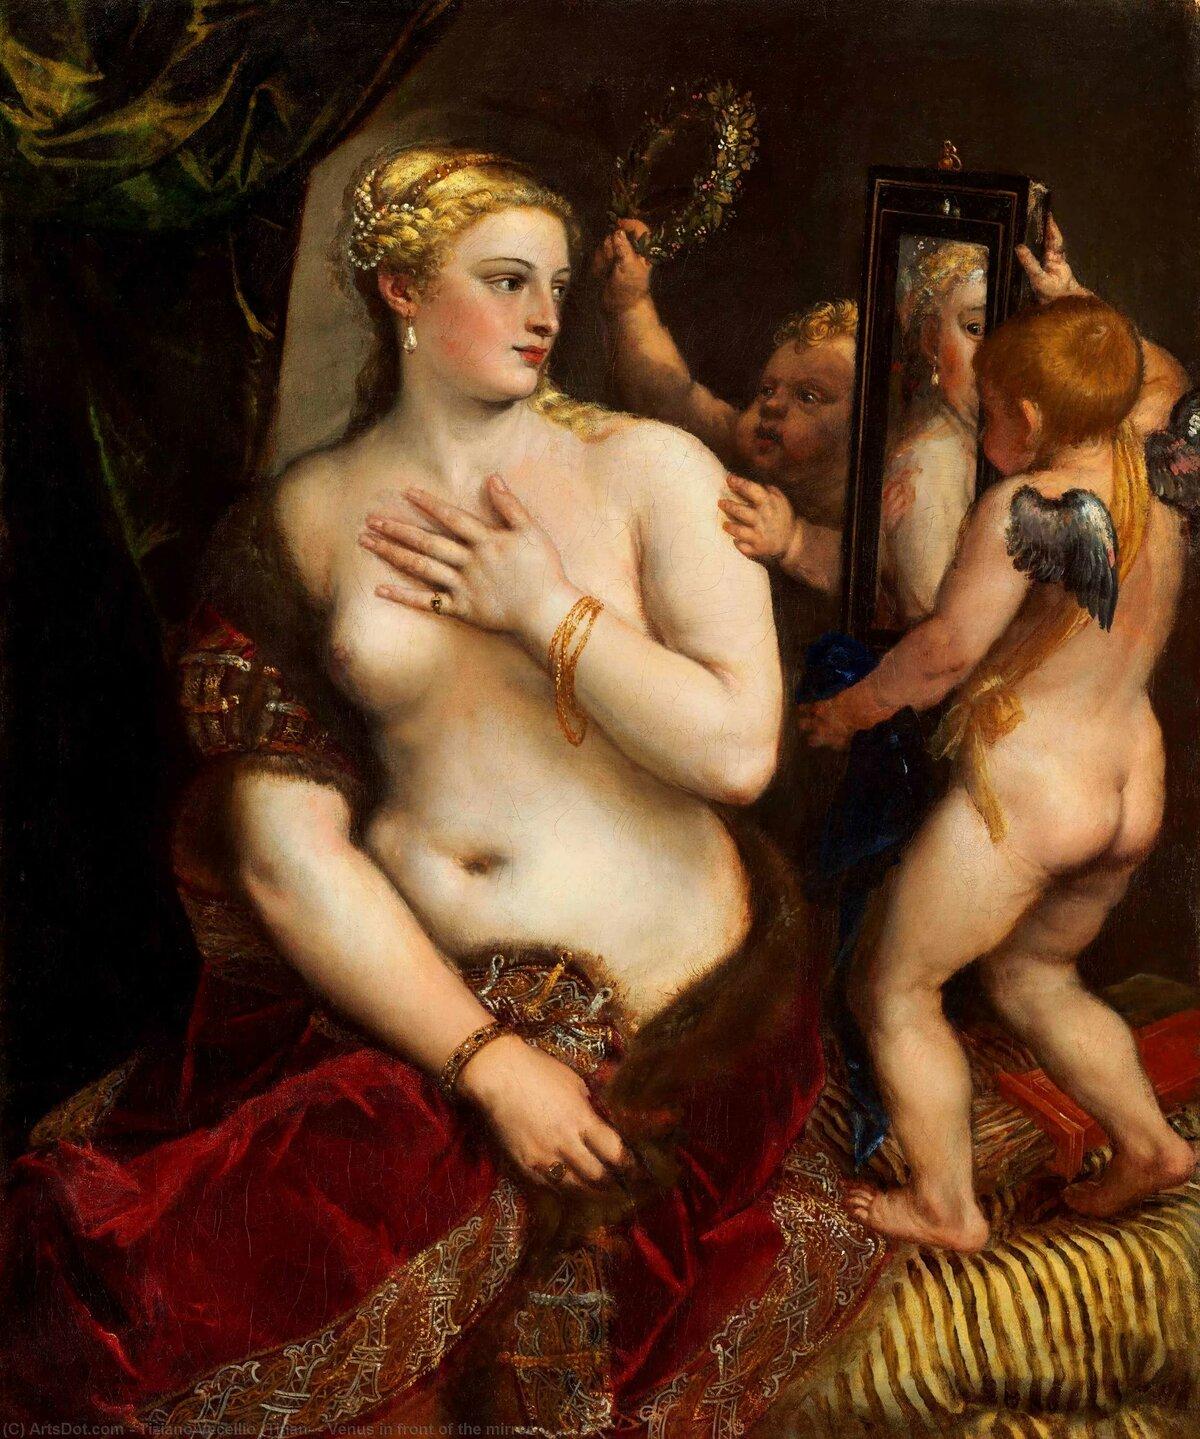 Italian artist sex images i — photo 13